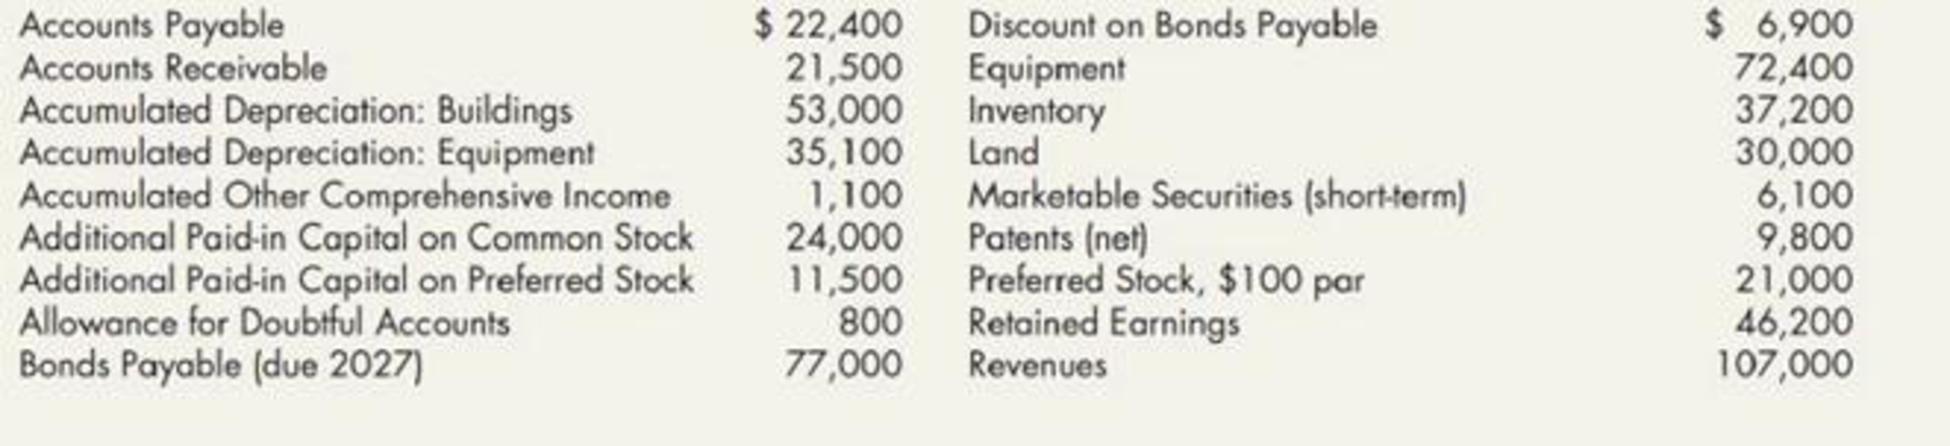 Chapter 4, Problem 7E, Balance Sheet Preparation The December 31, 2019, balance sheet accounts of Hitt Company are shown , example  1